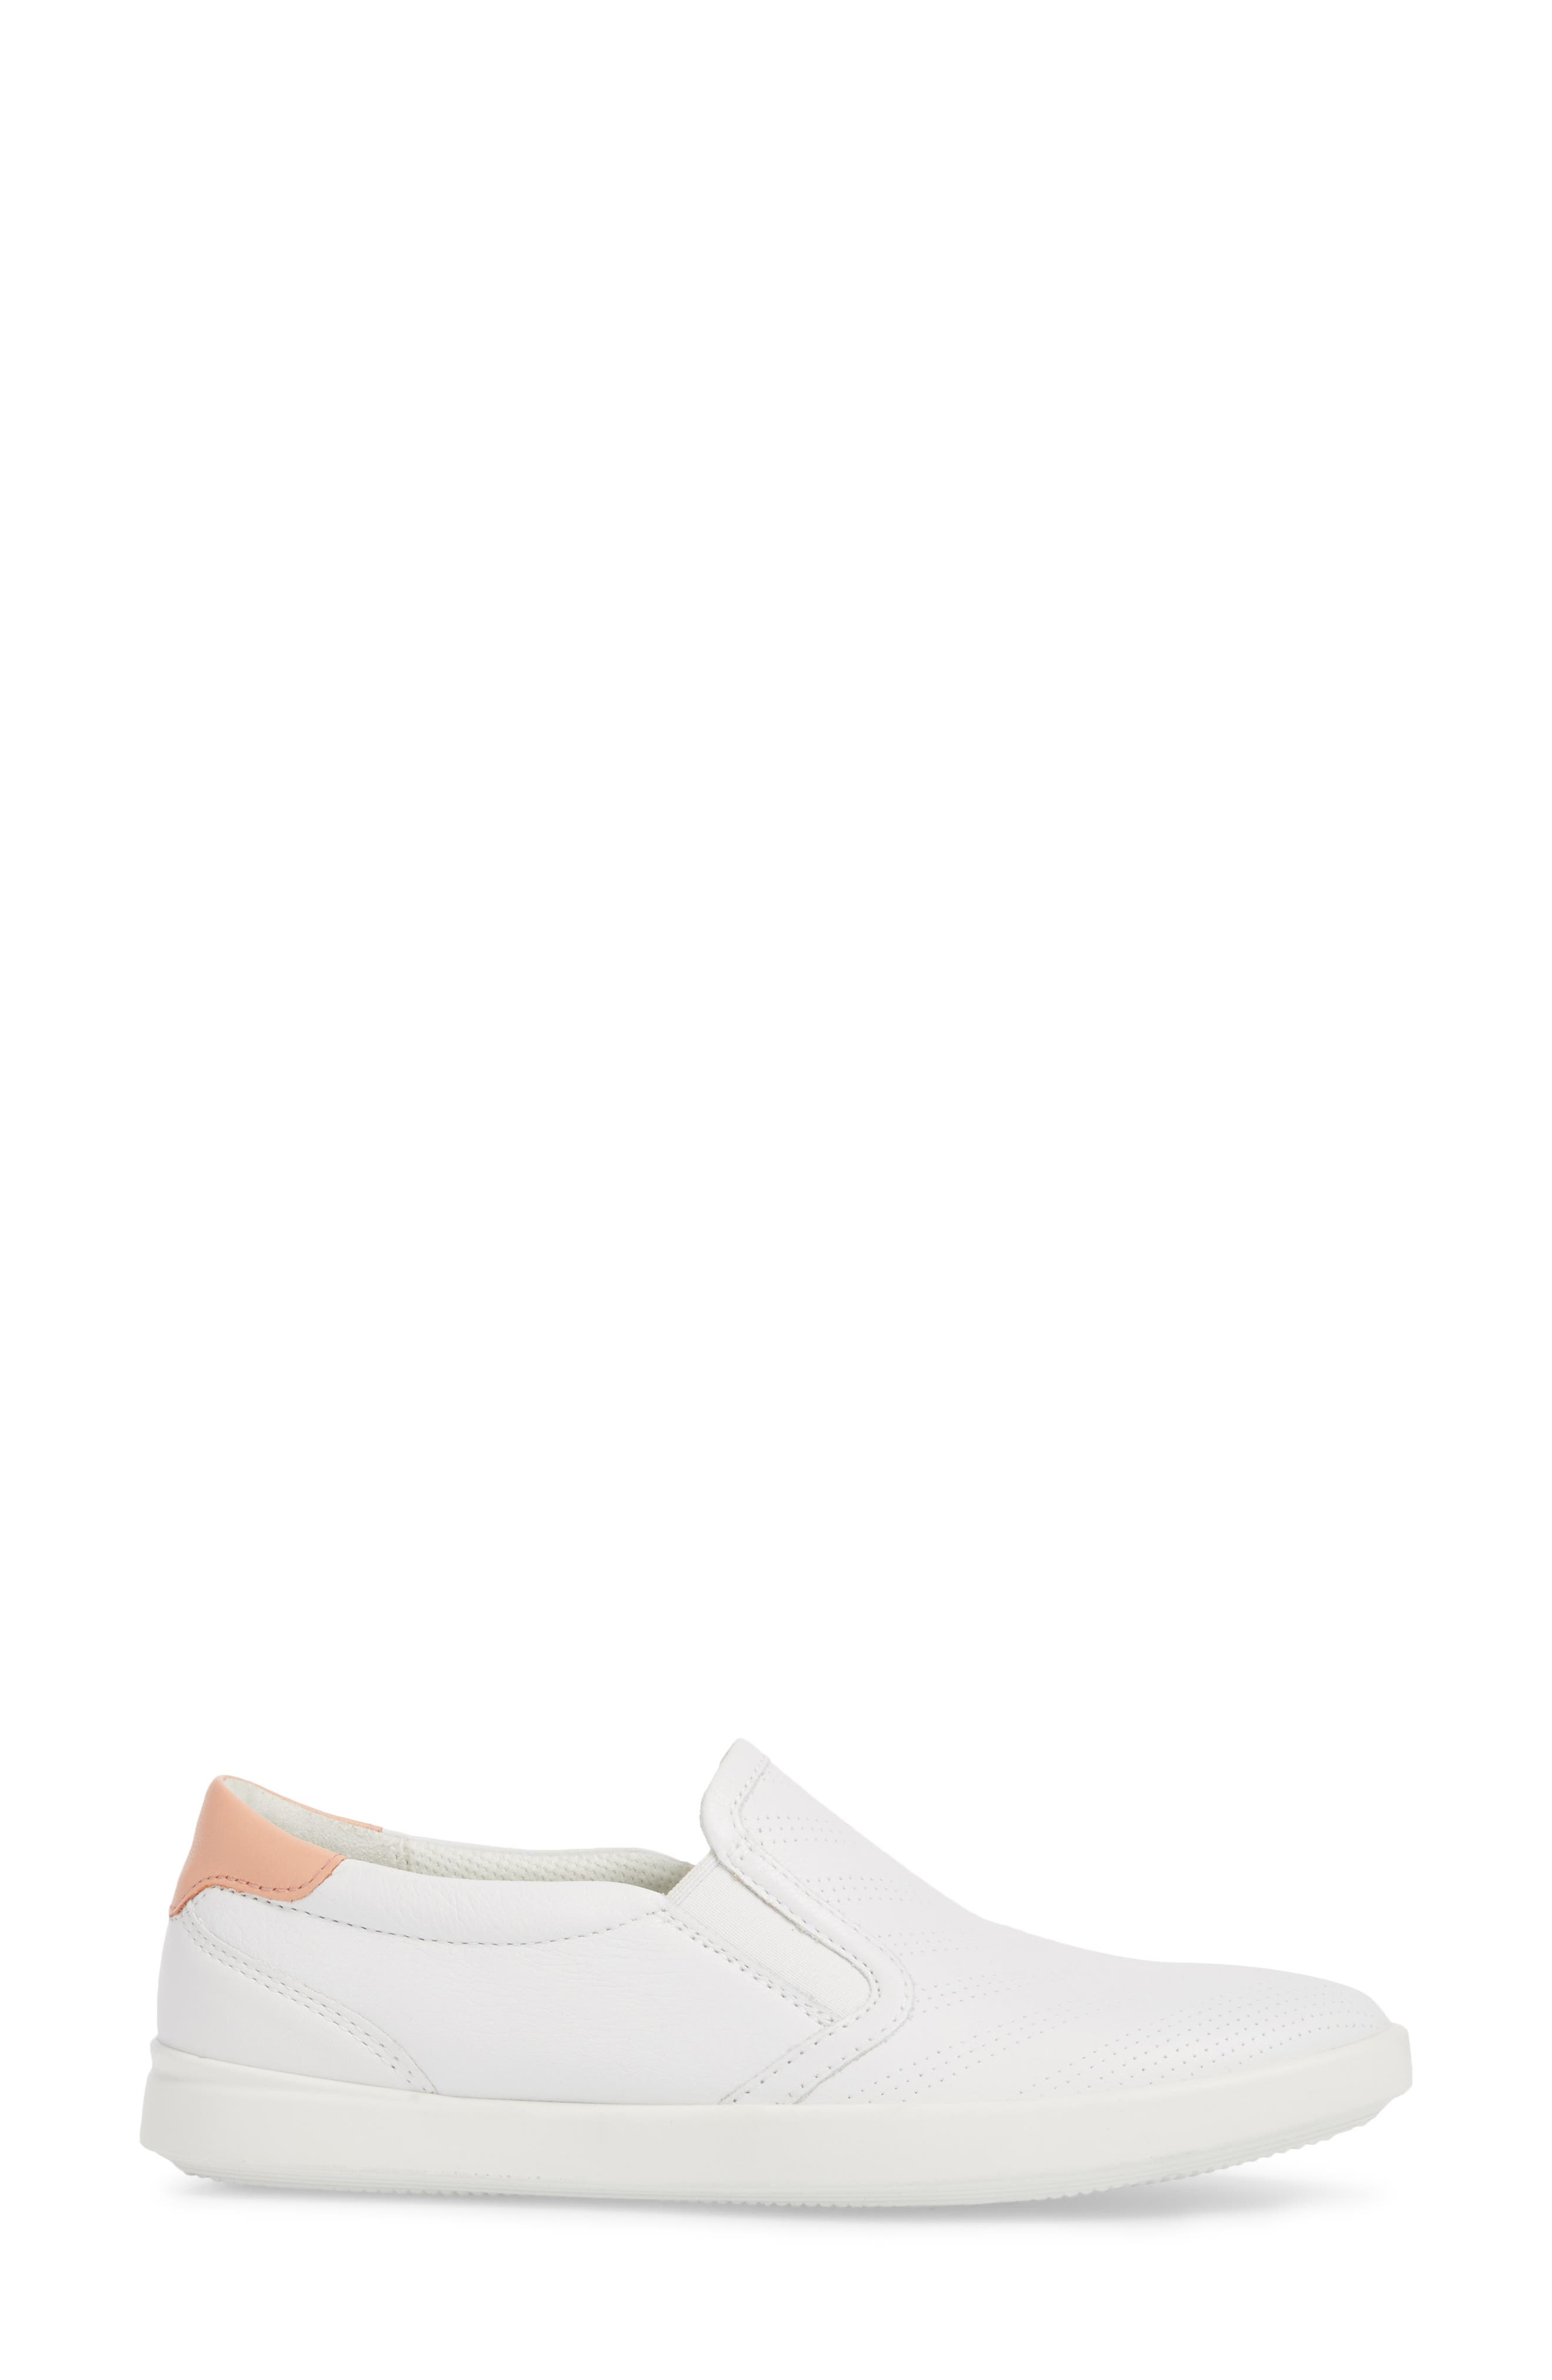 Alternate Image 3  - ECCO 'Aimee' Slip-On Sneaker (Women)